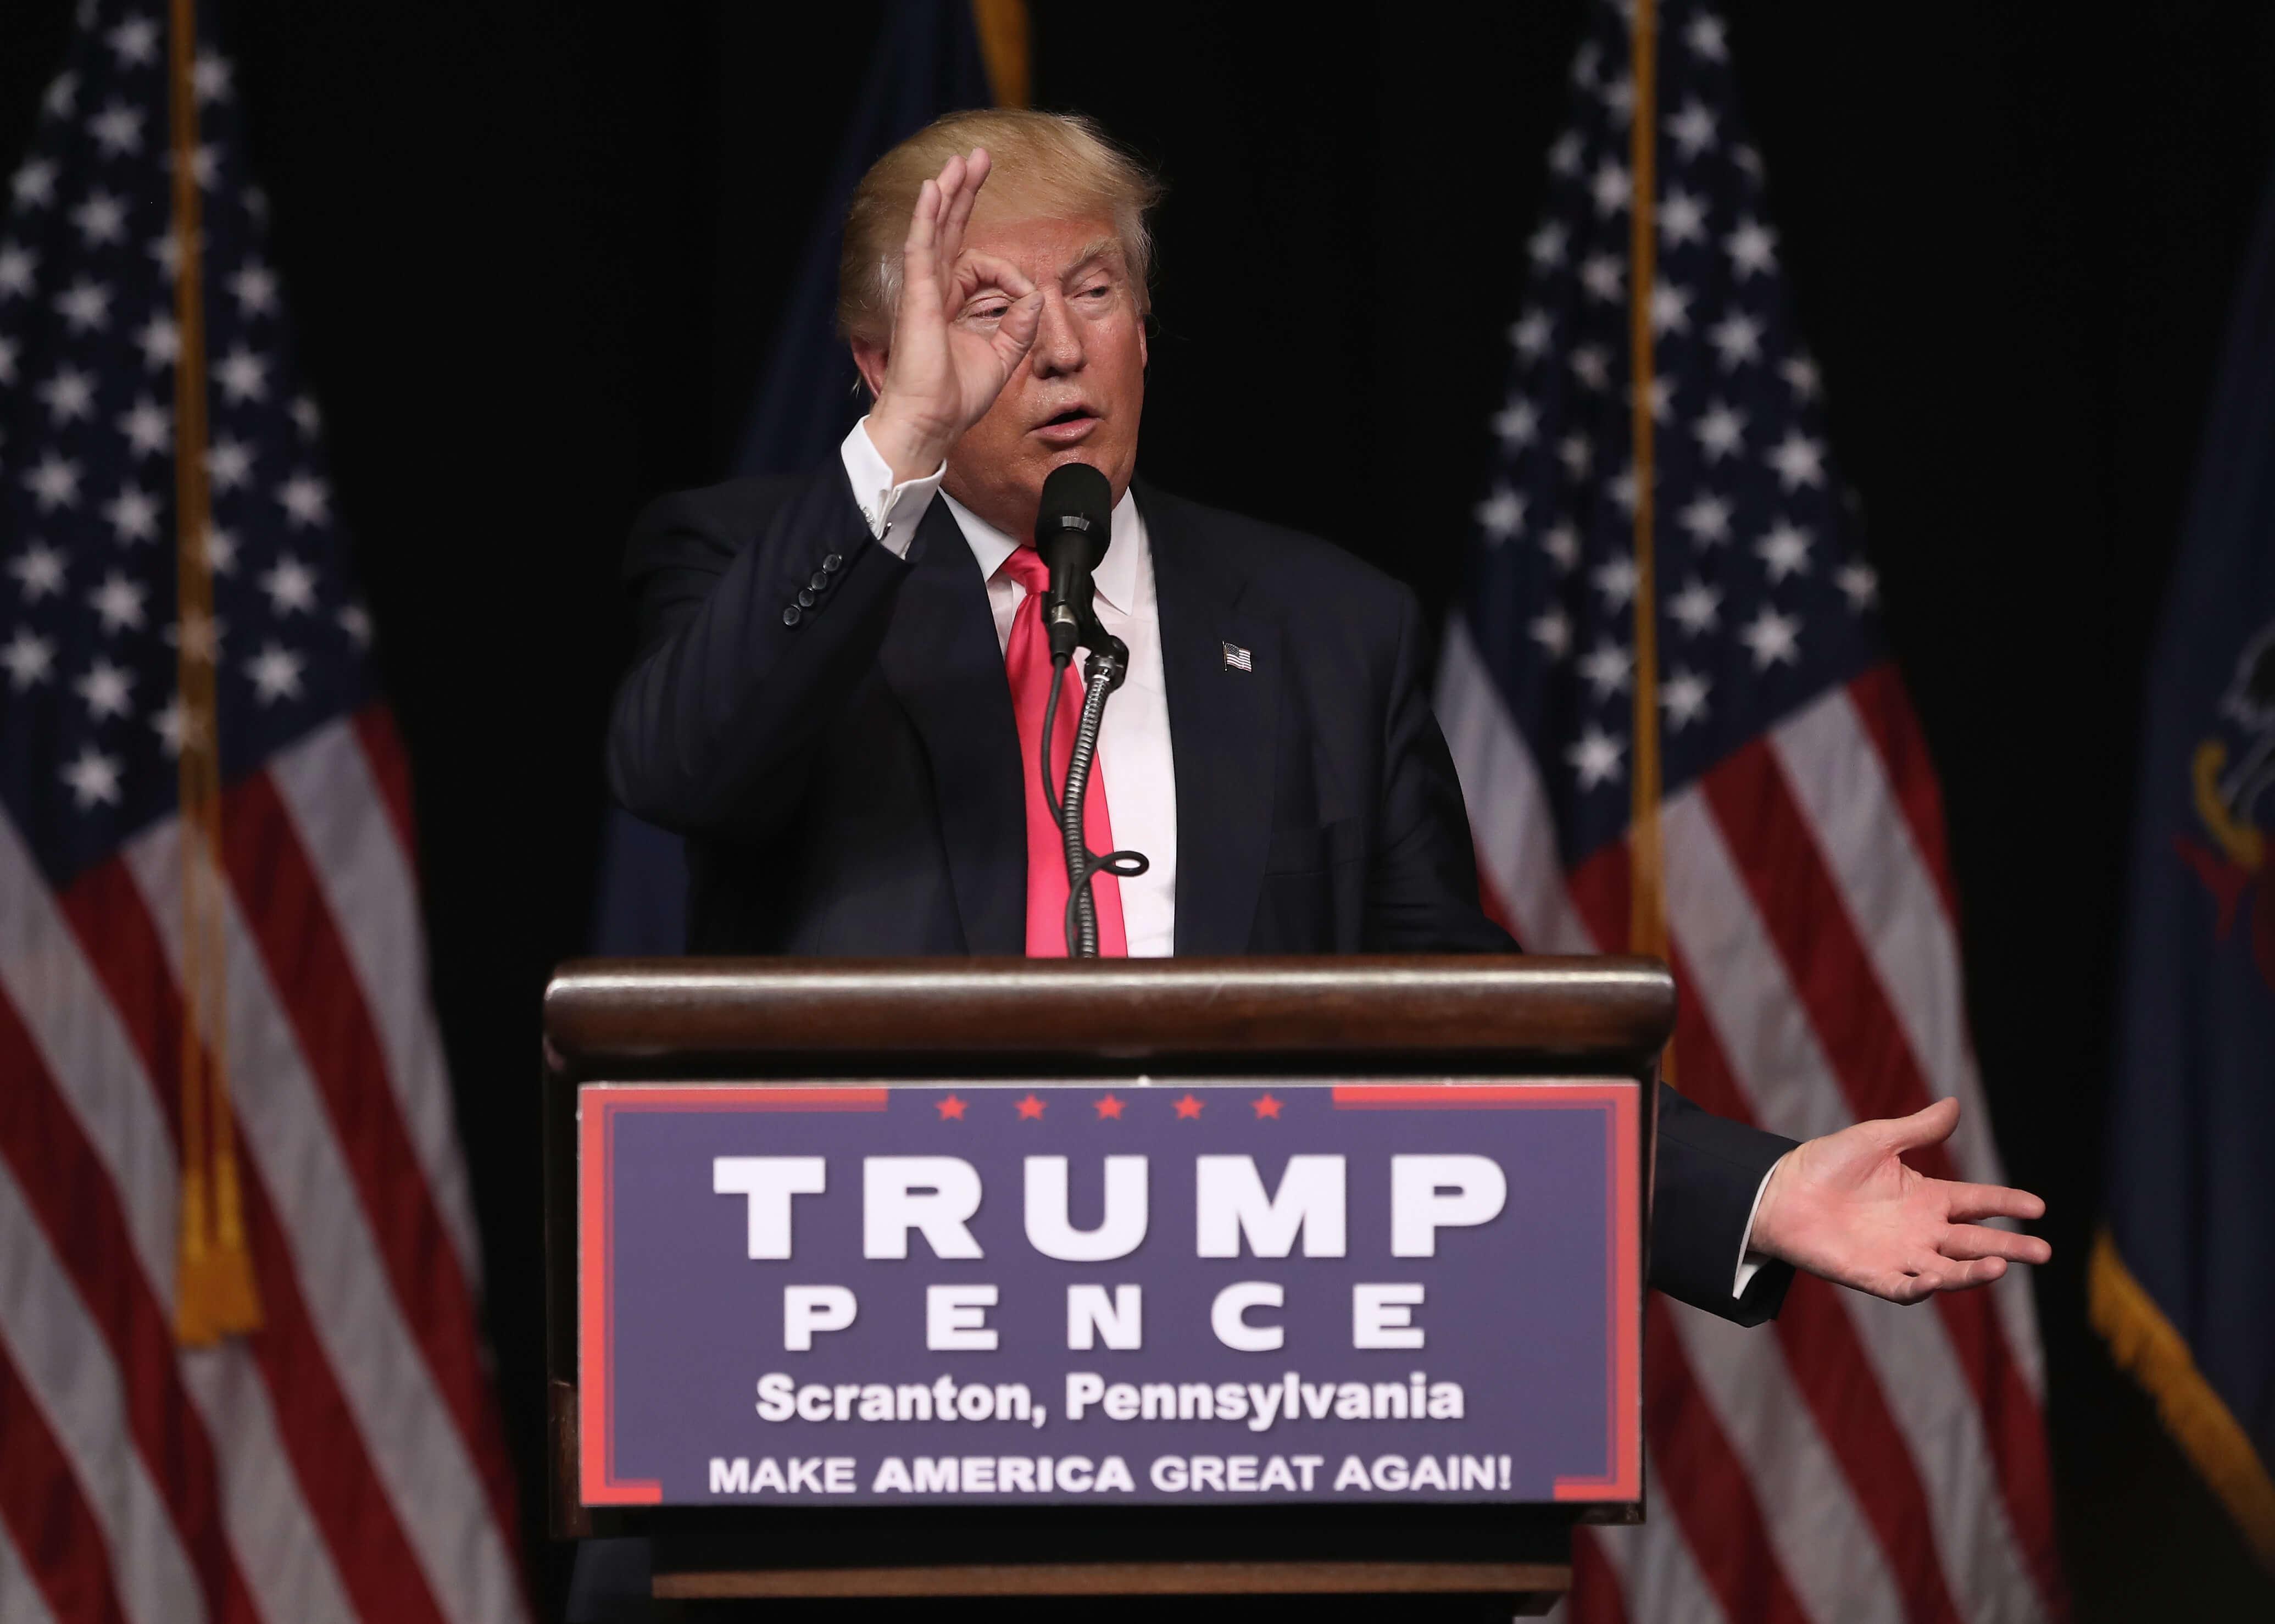 The Donald Trump Welfare Plan: Tying Welfare to Work